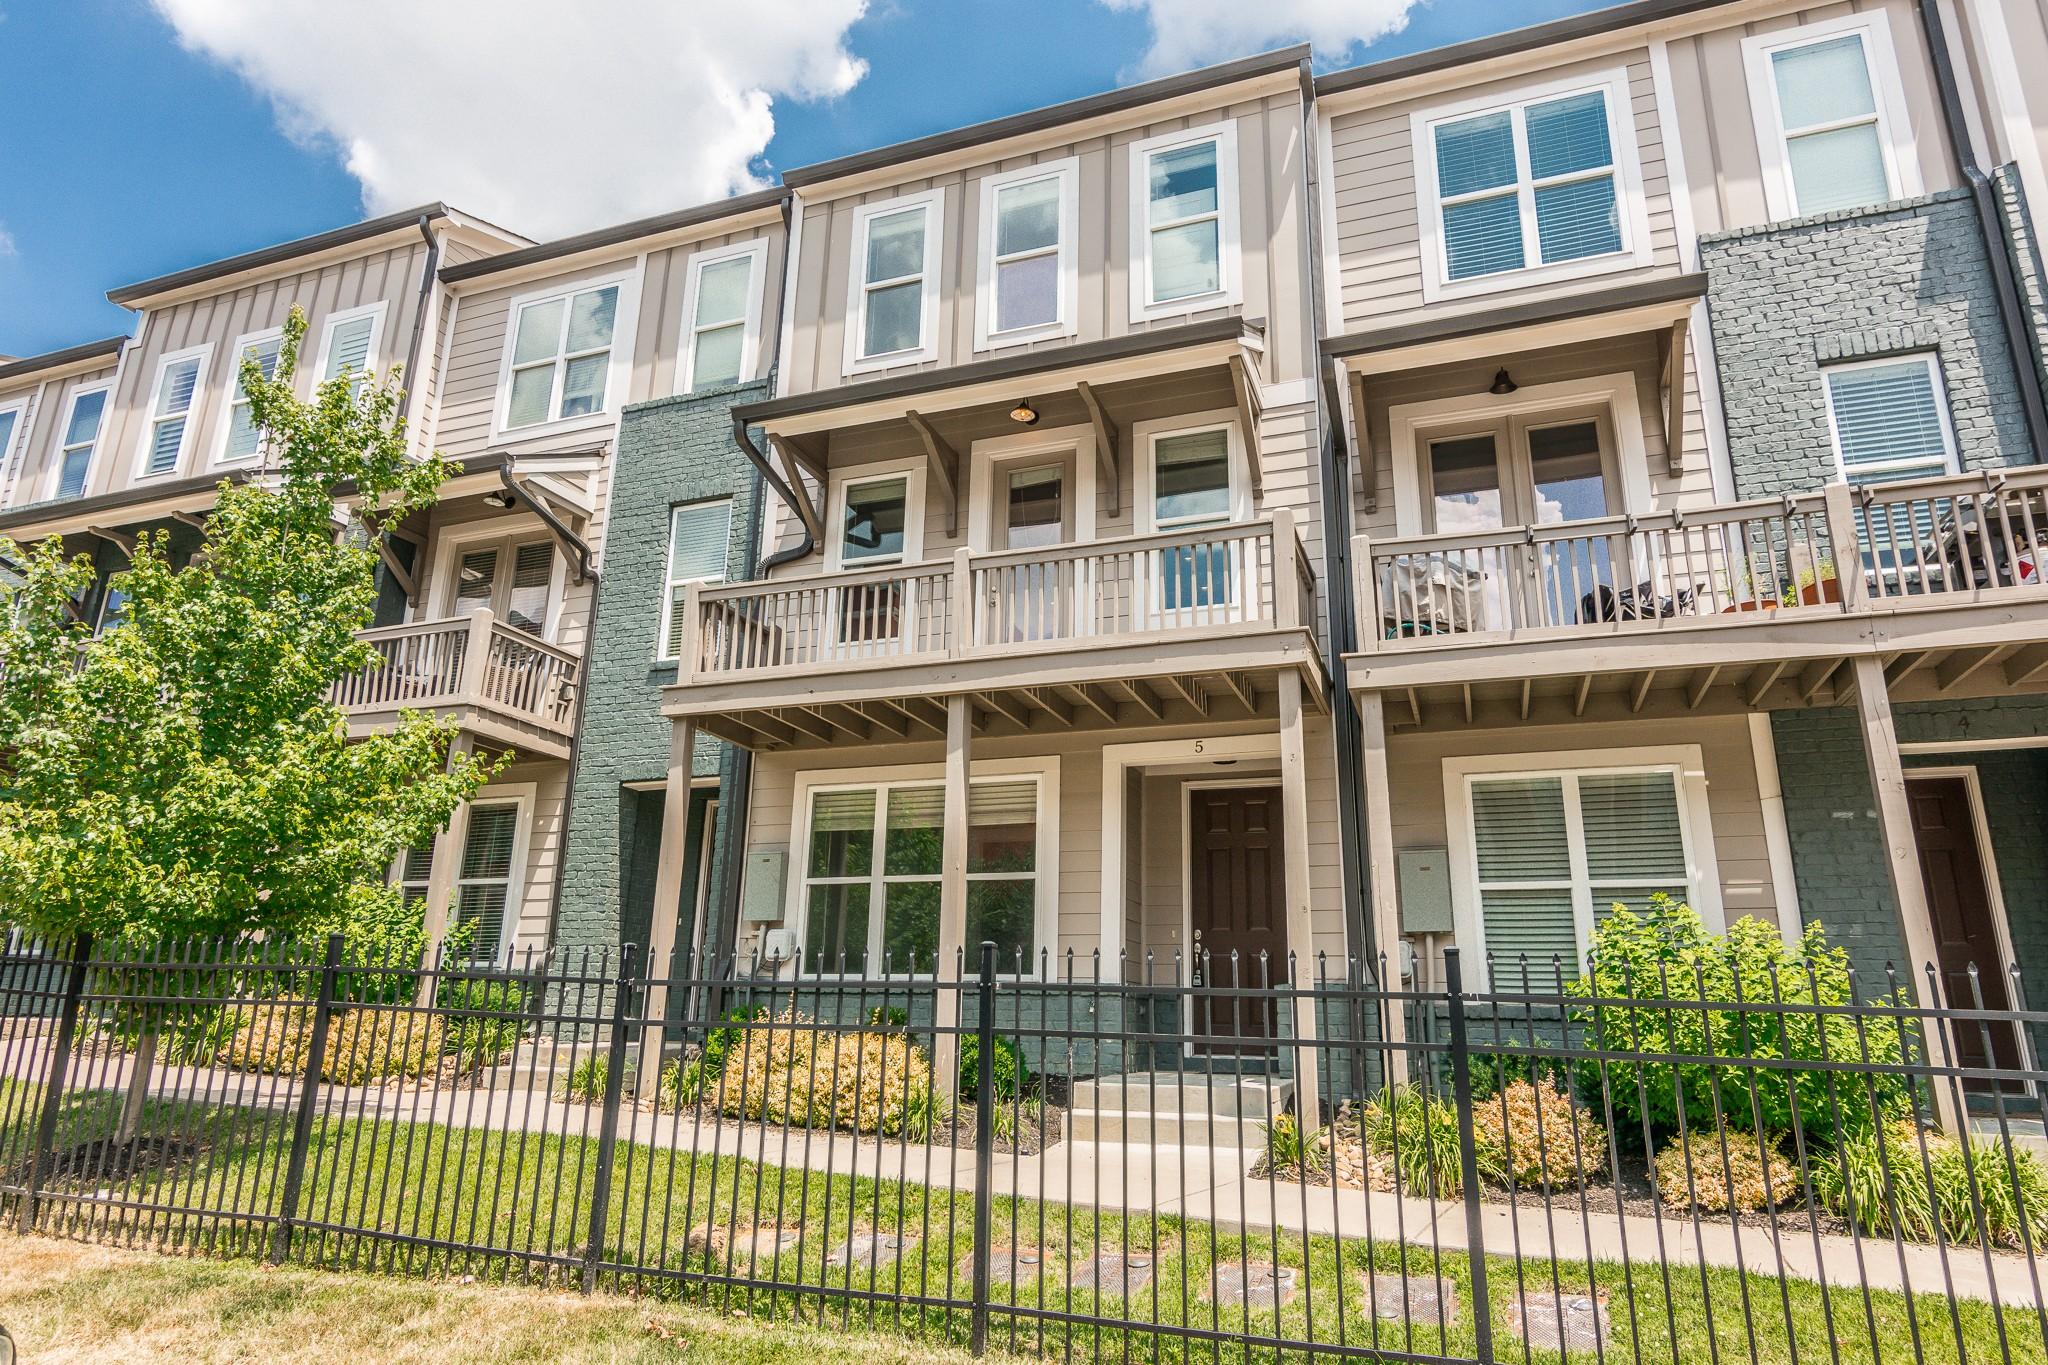 1815 Ridley Blvd #5 Property Photo - Nashville, TN real estate listing